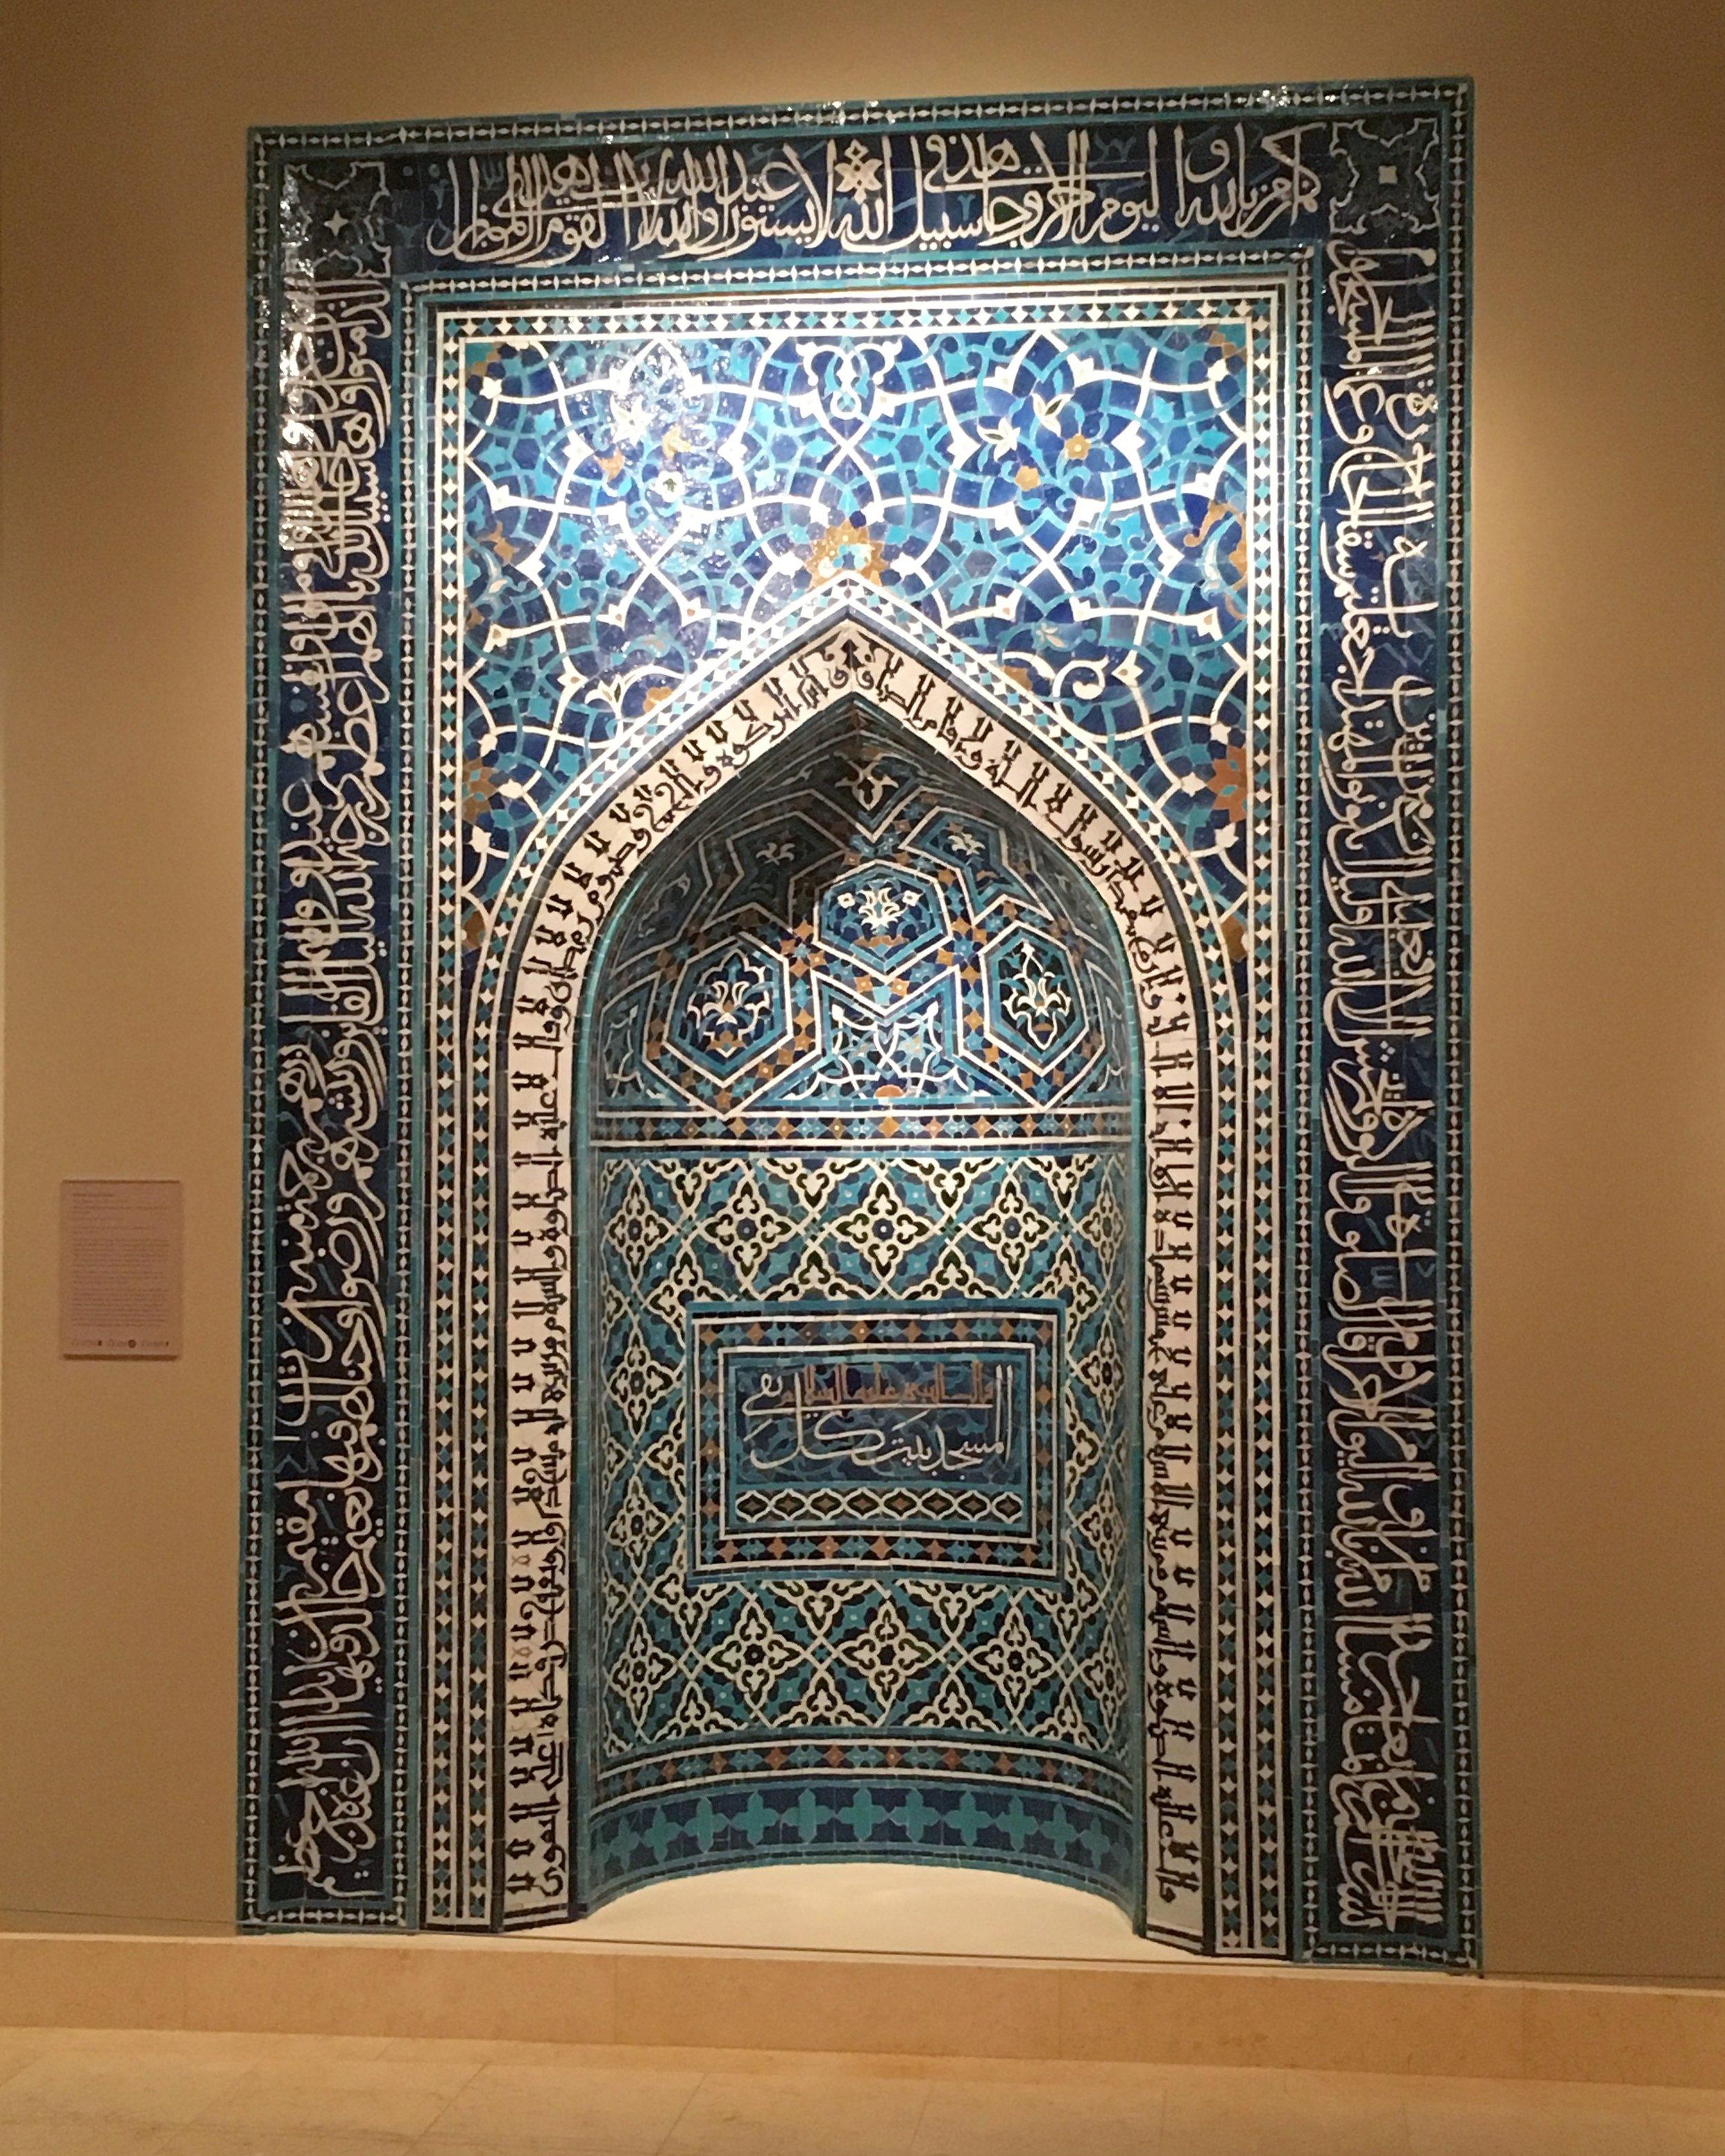 Turquoise Mosaic Prayer Niche, Metropolitan Museum of Art, Islamic Wing.